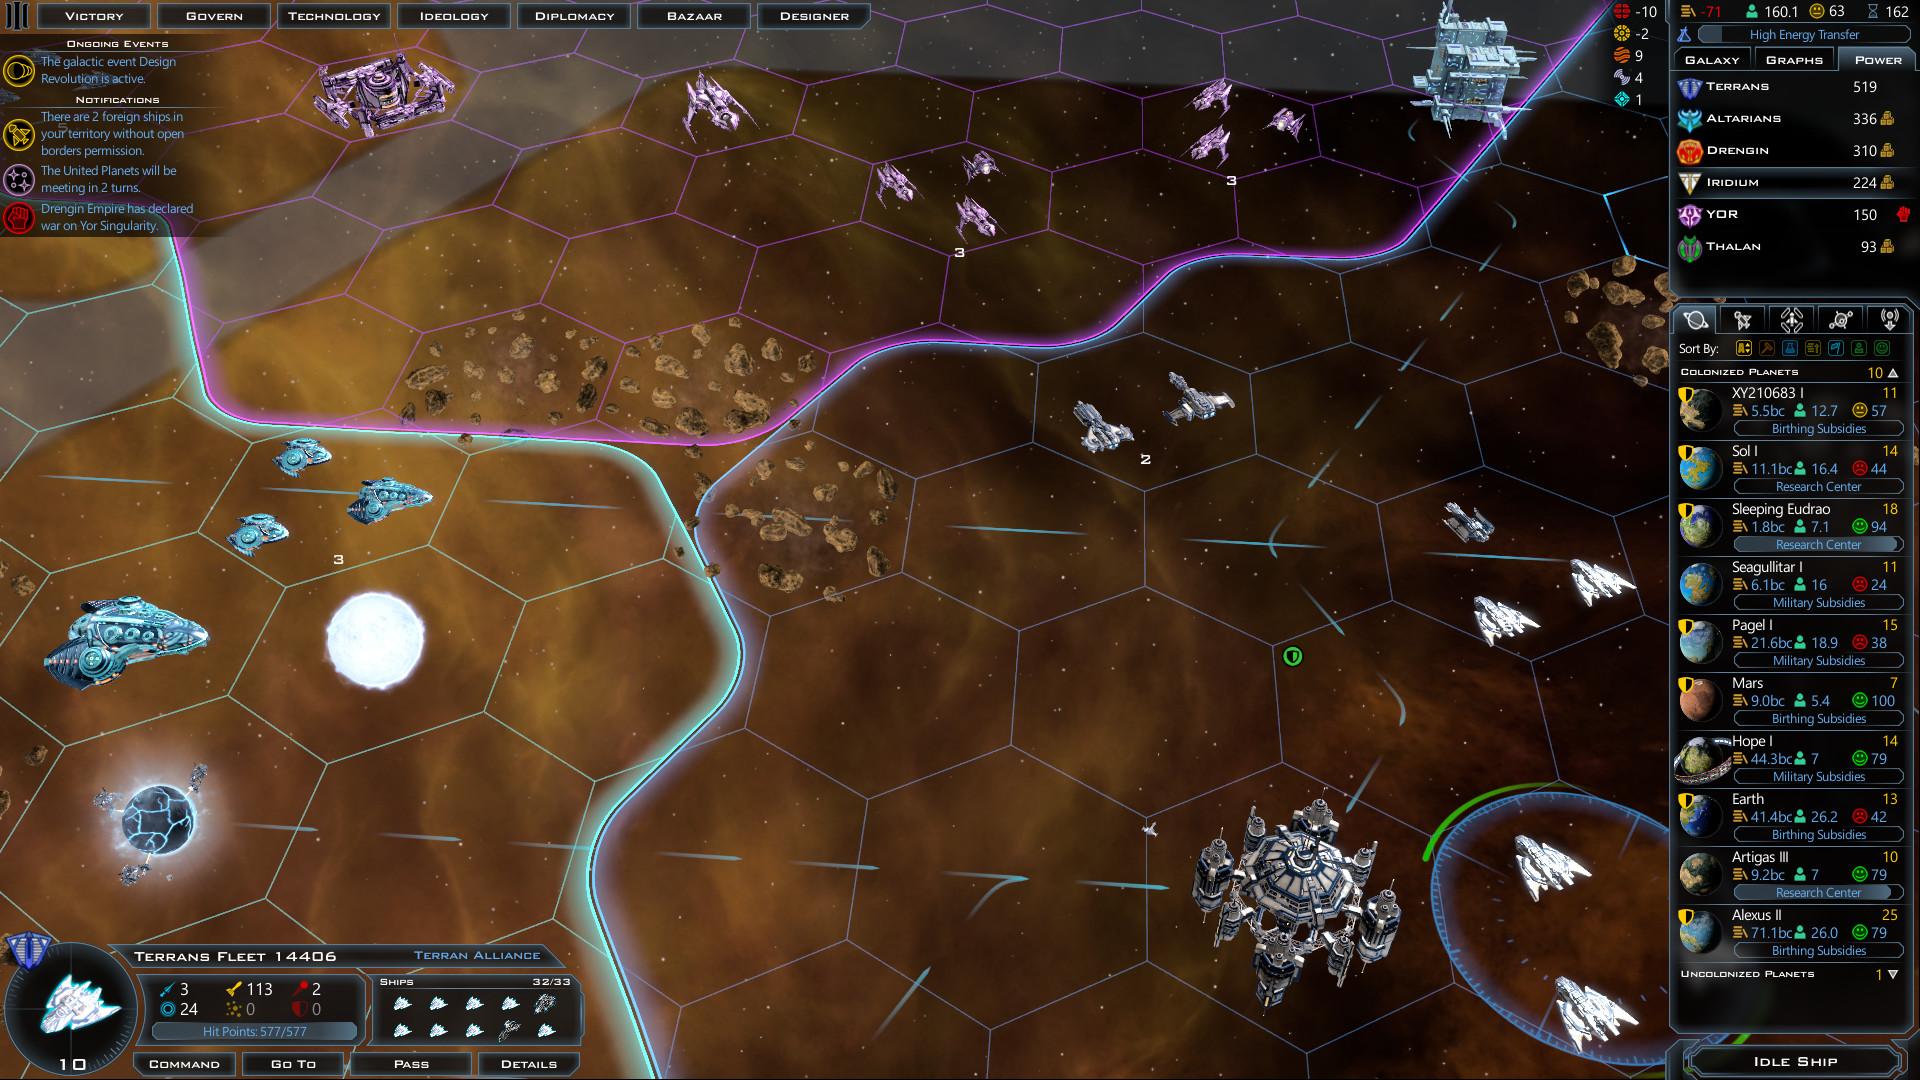 Galactic Civilizations III Lost Treasures Features